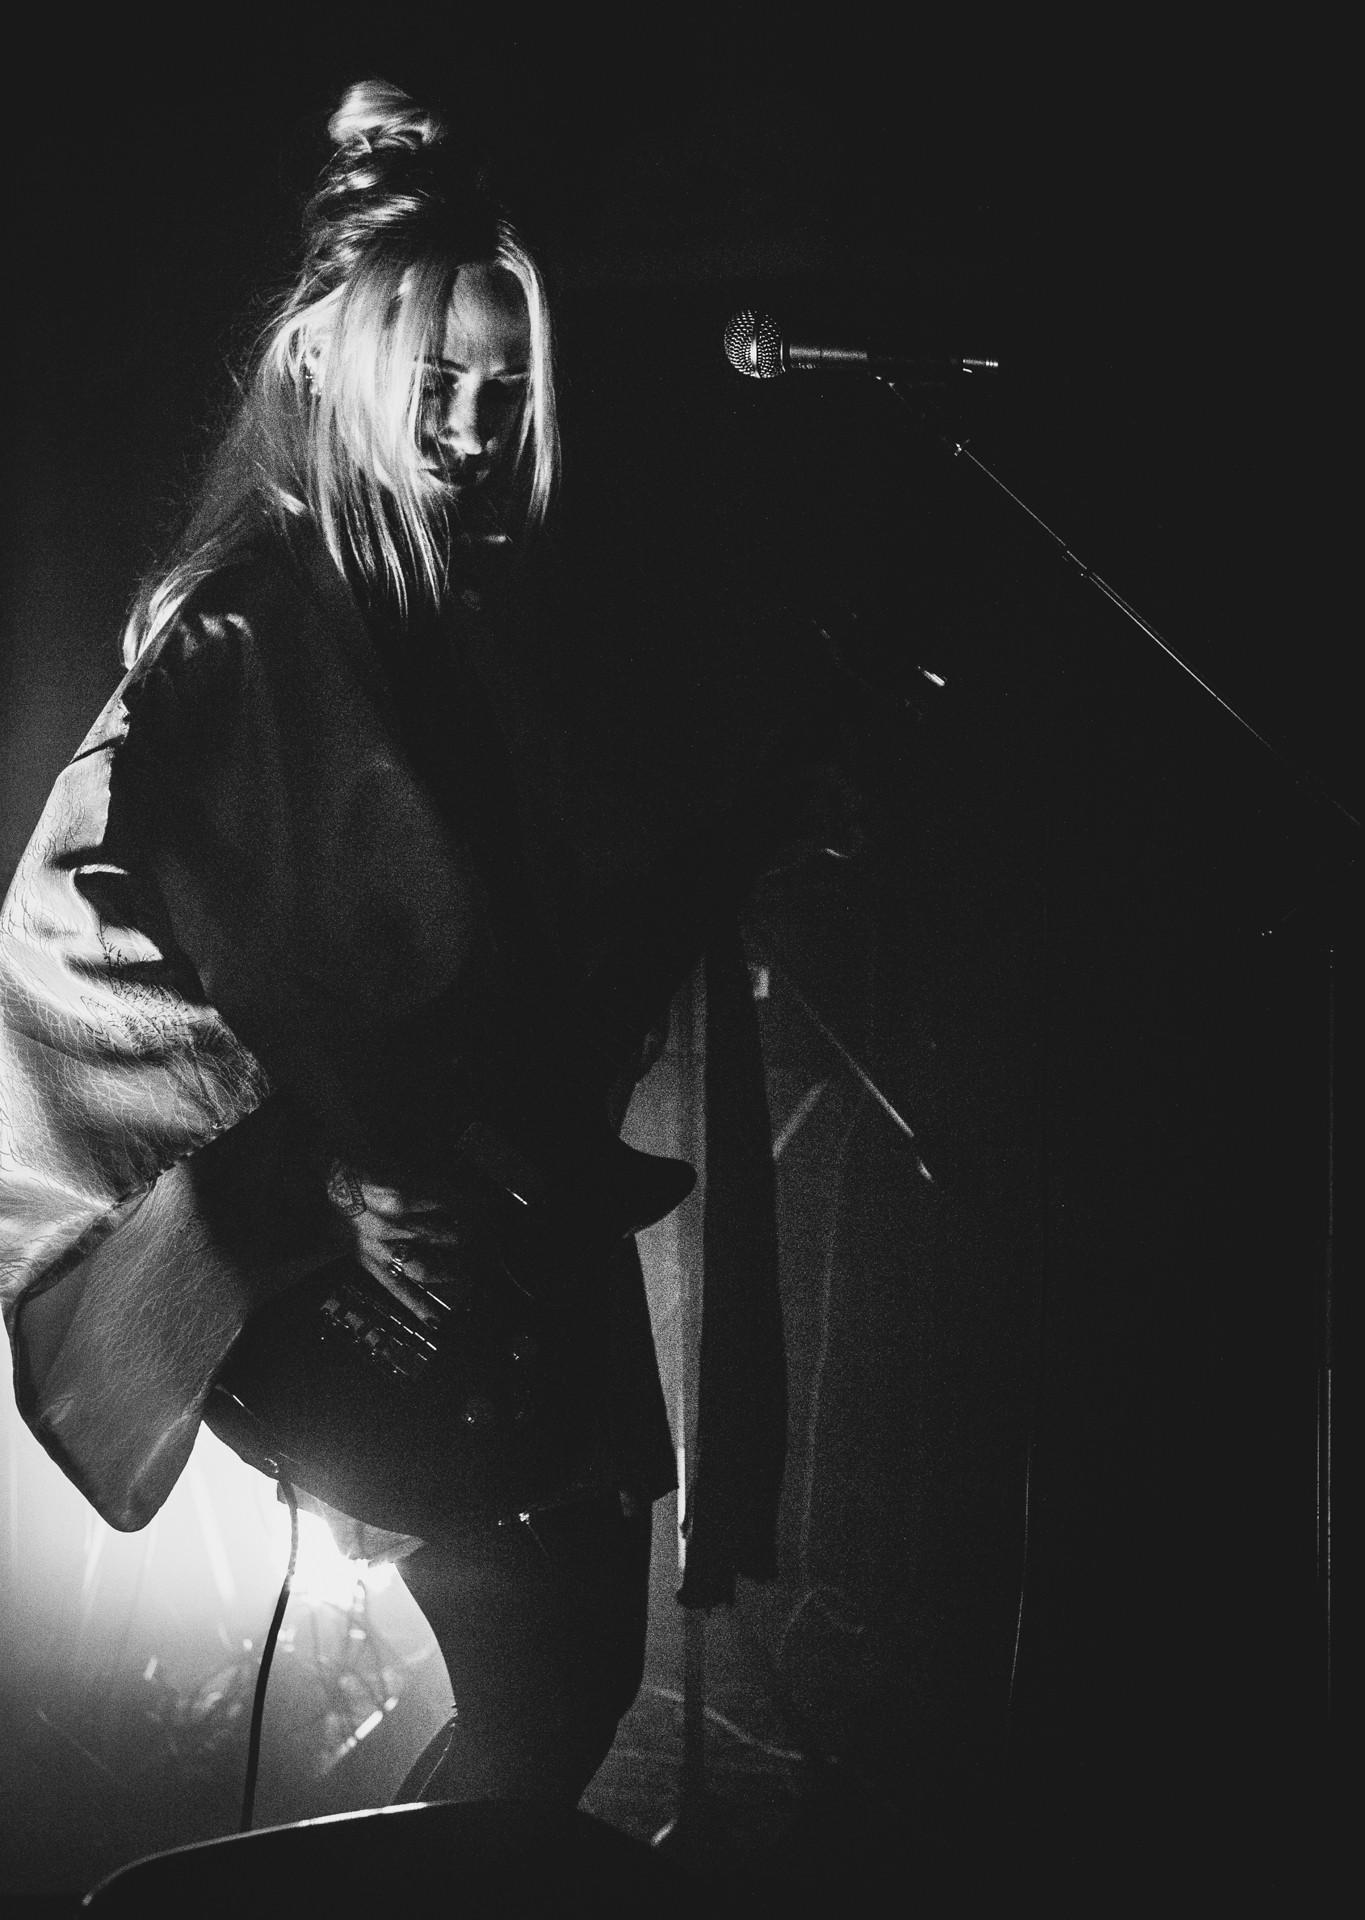 05/09/18 at Sveta Baar / Photo by Evert Palmets